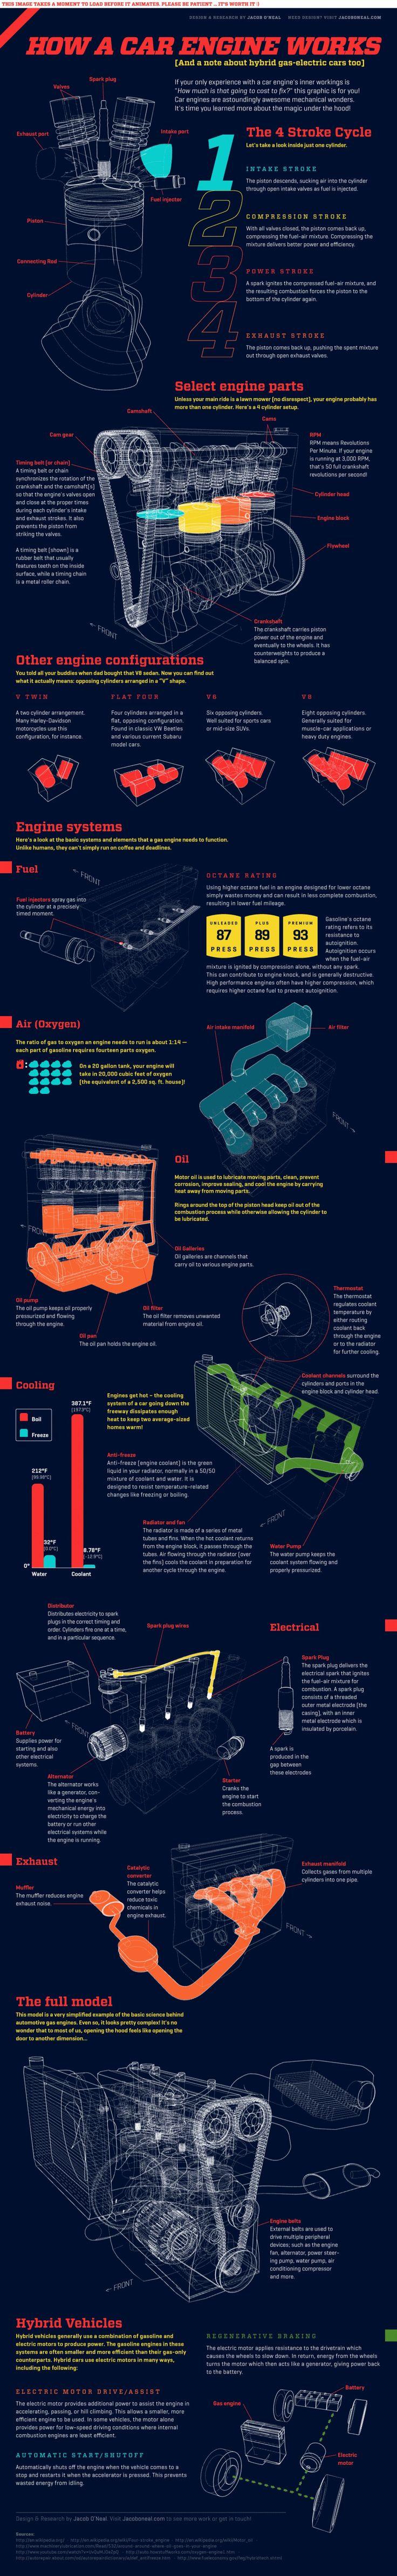 728 best car and motor infographics images on pinterest info graphics infographic and. Black Bedroom Furniture Sets. Home Design Ideas